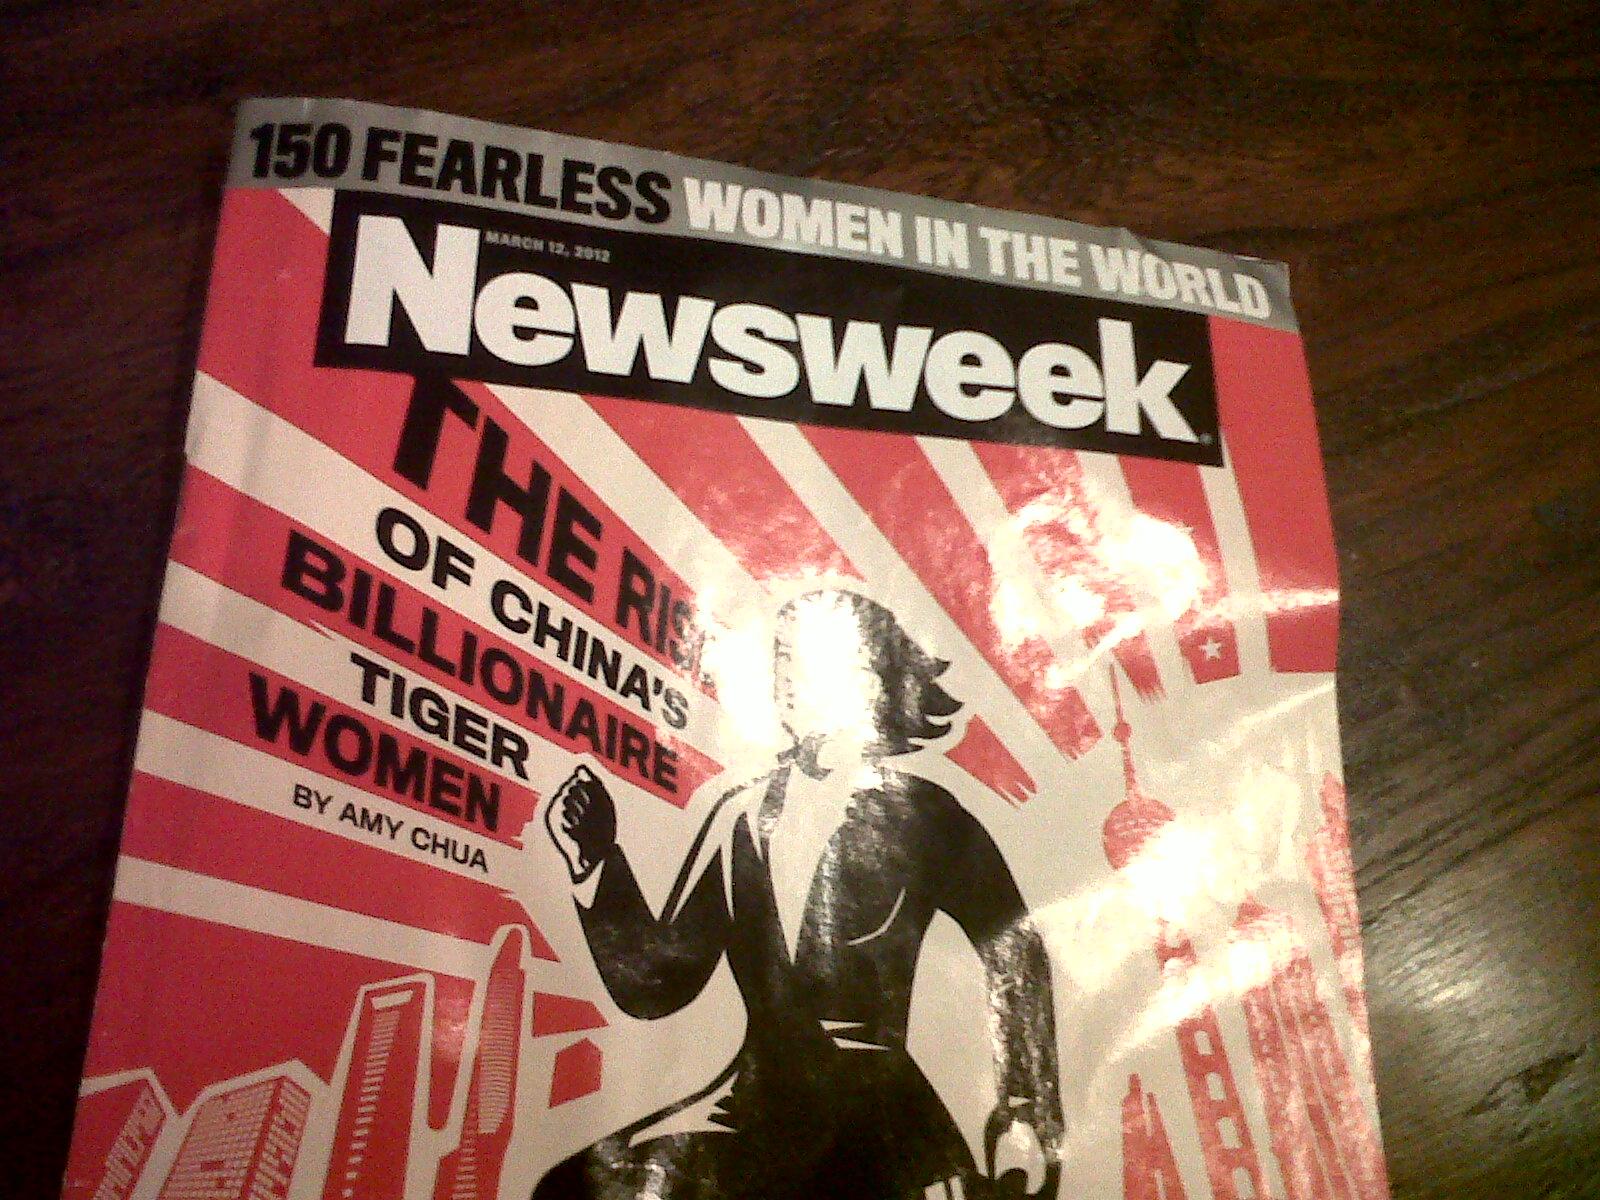 http://2.bp.blogspot.com/-0dIOAAZLwAc/T5eDimeQpRI/AAAAAAAANc4/9xUsPIzCGGM/s1600/Asiaweek-Fearless+women.jpg